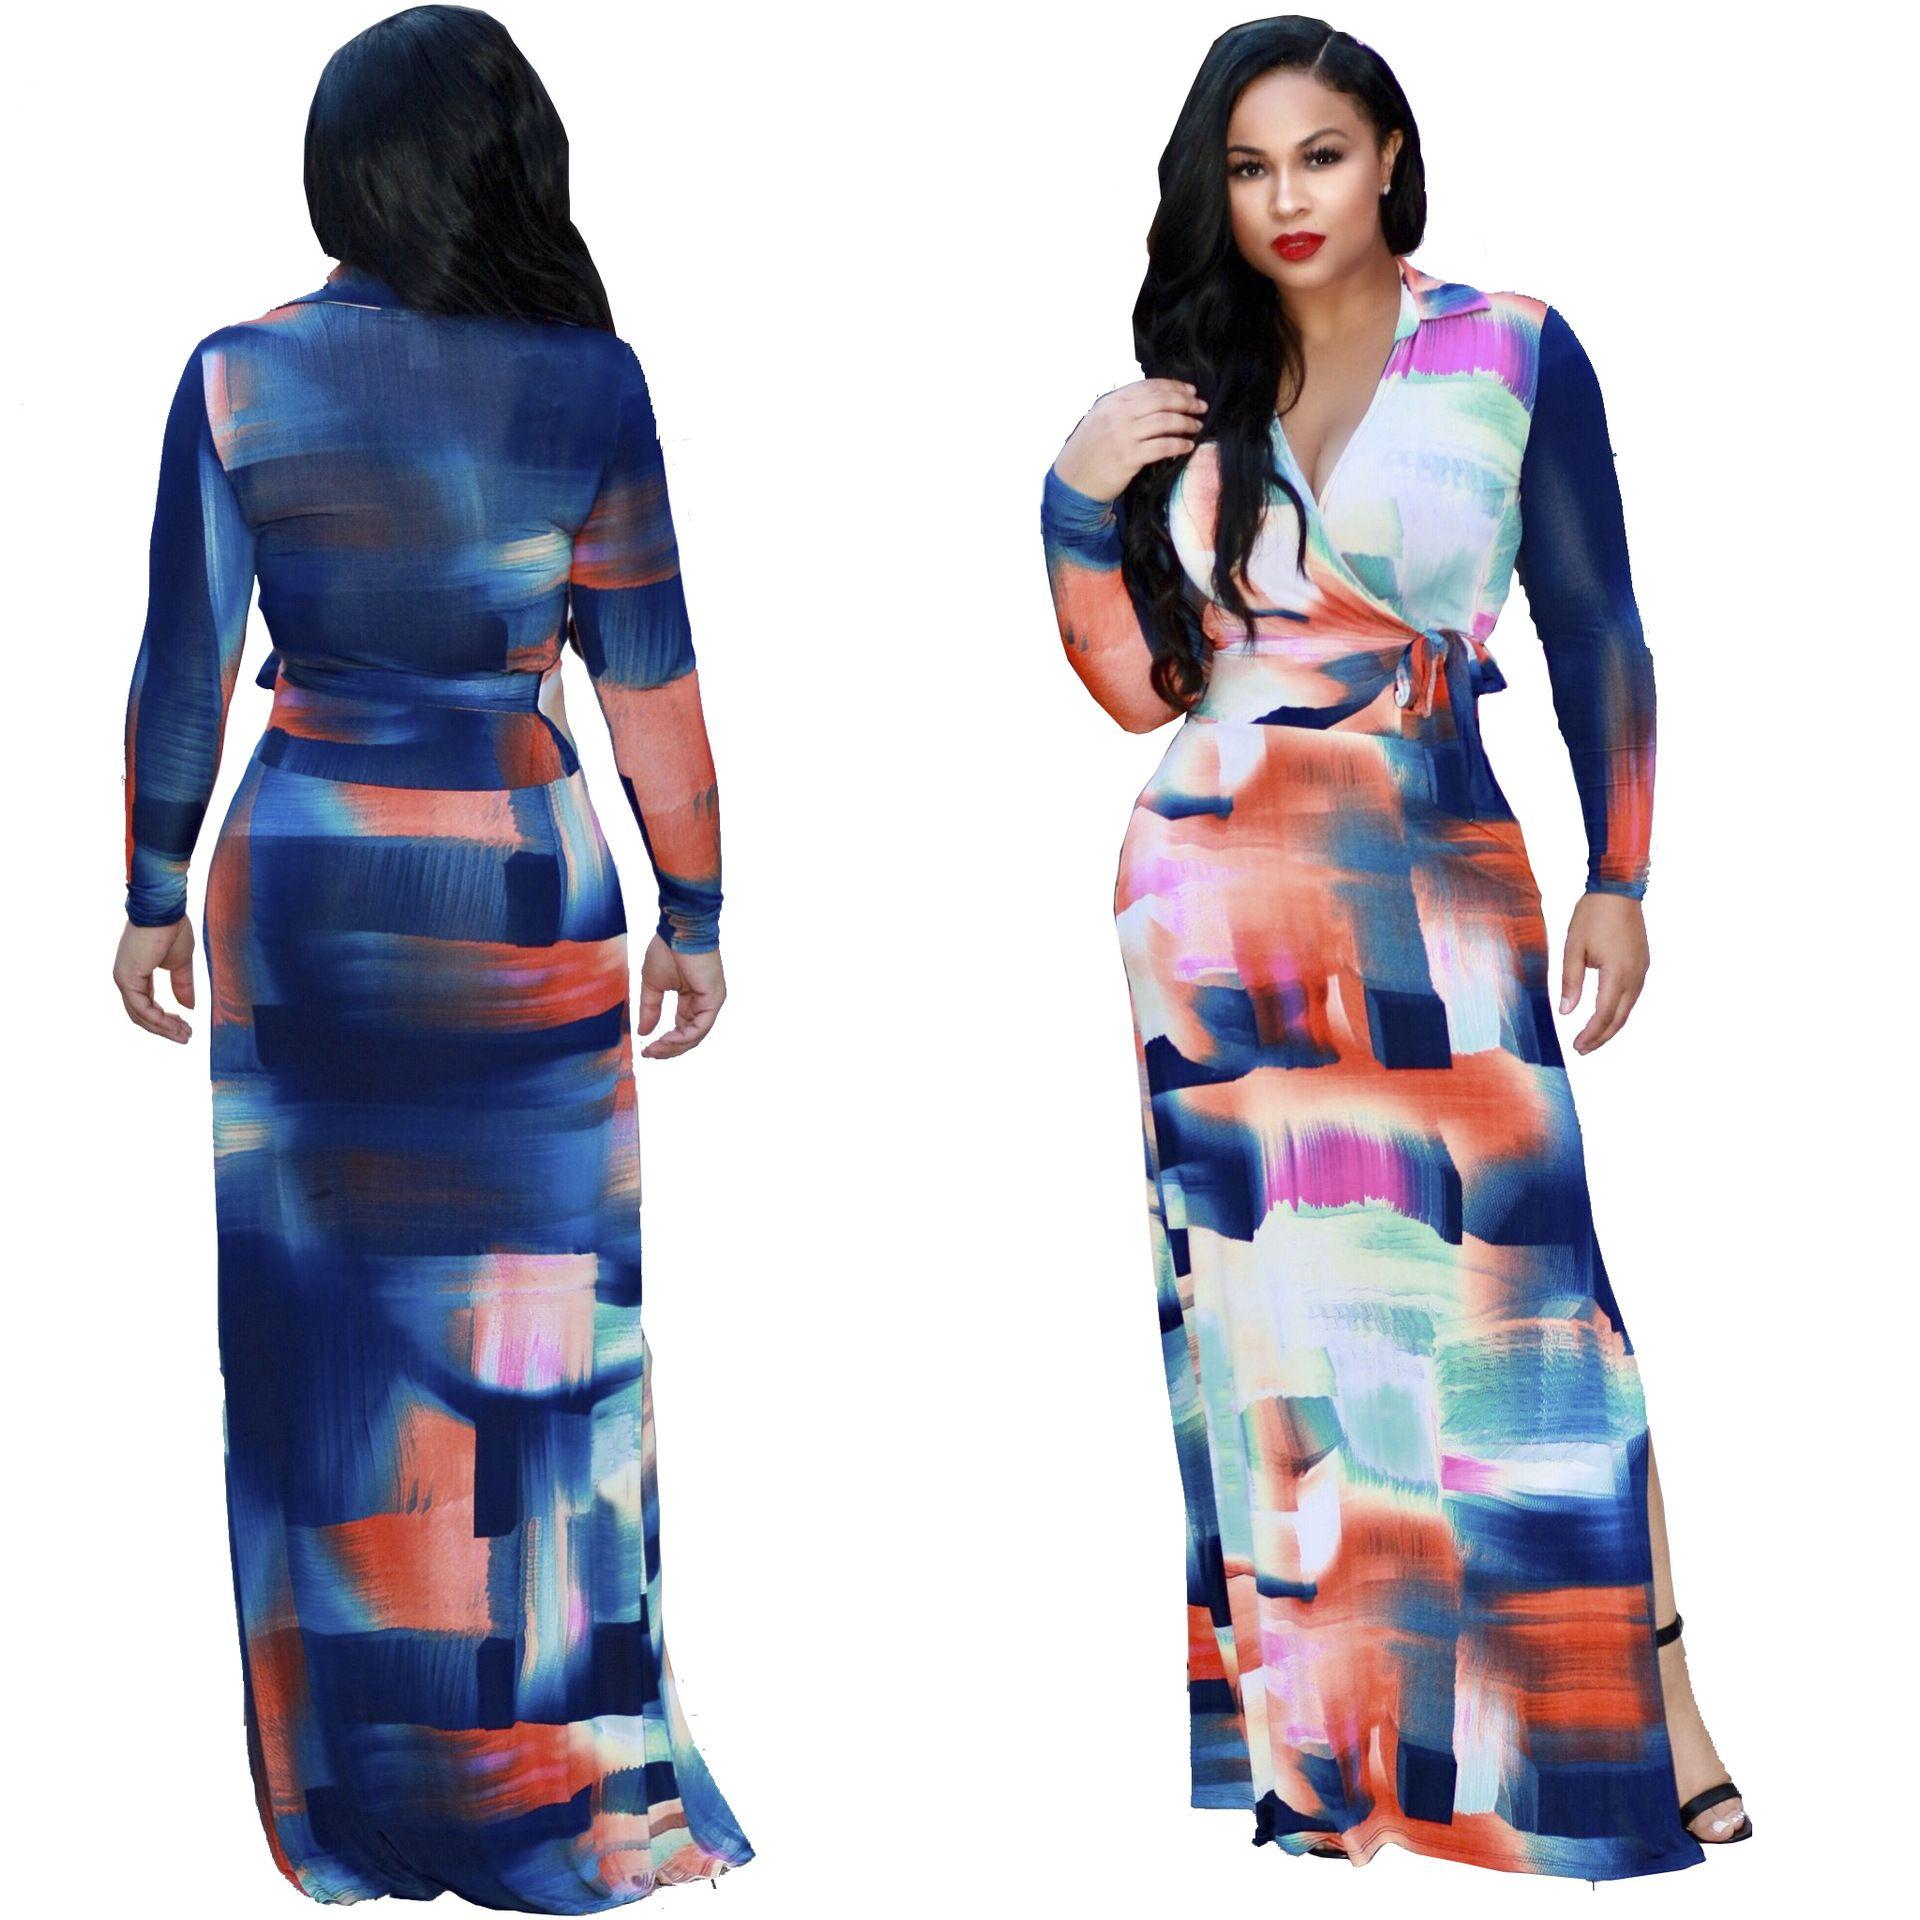 Women Printed Dresses Slit Long Sleeve Sheath New Fashion Maxi Long Party Bohemian Boho Tunic Dress Oversizes